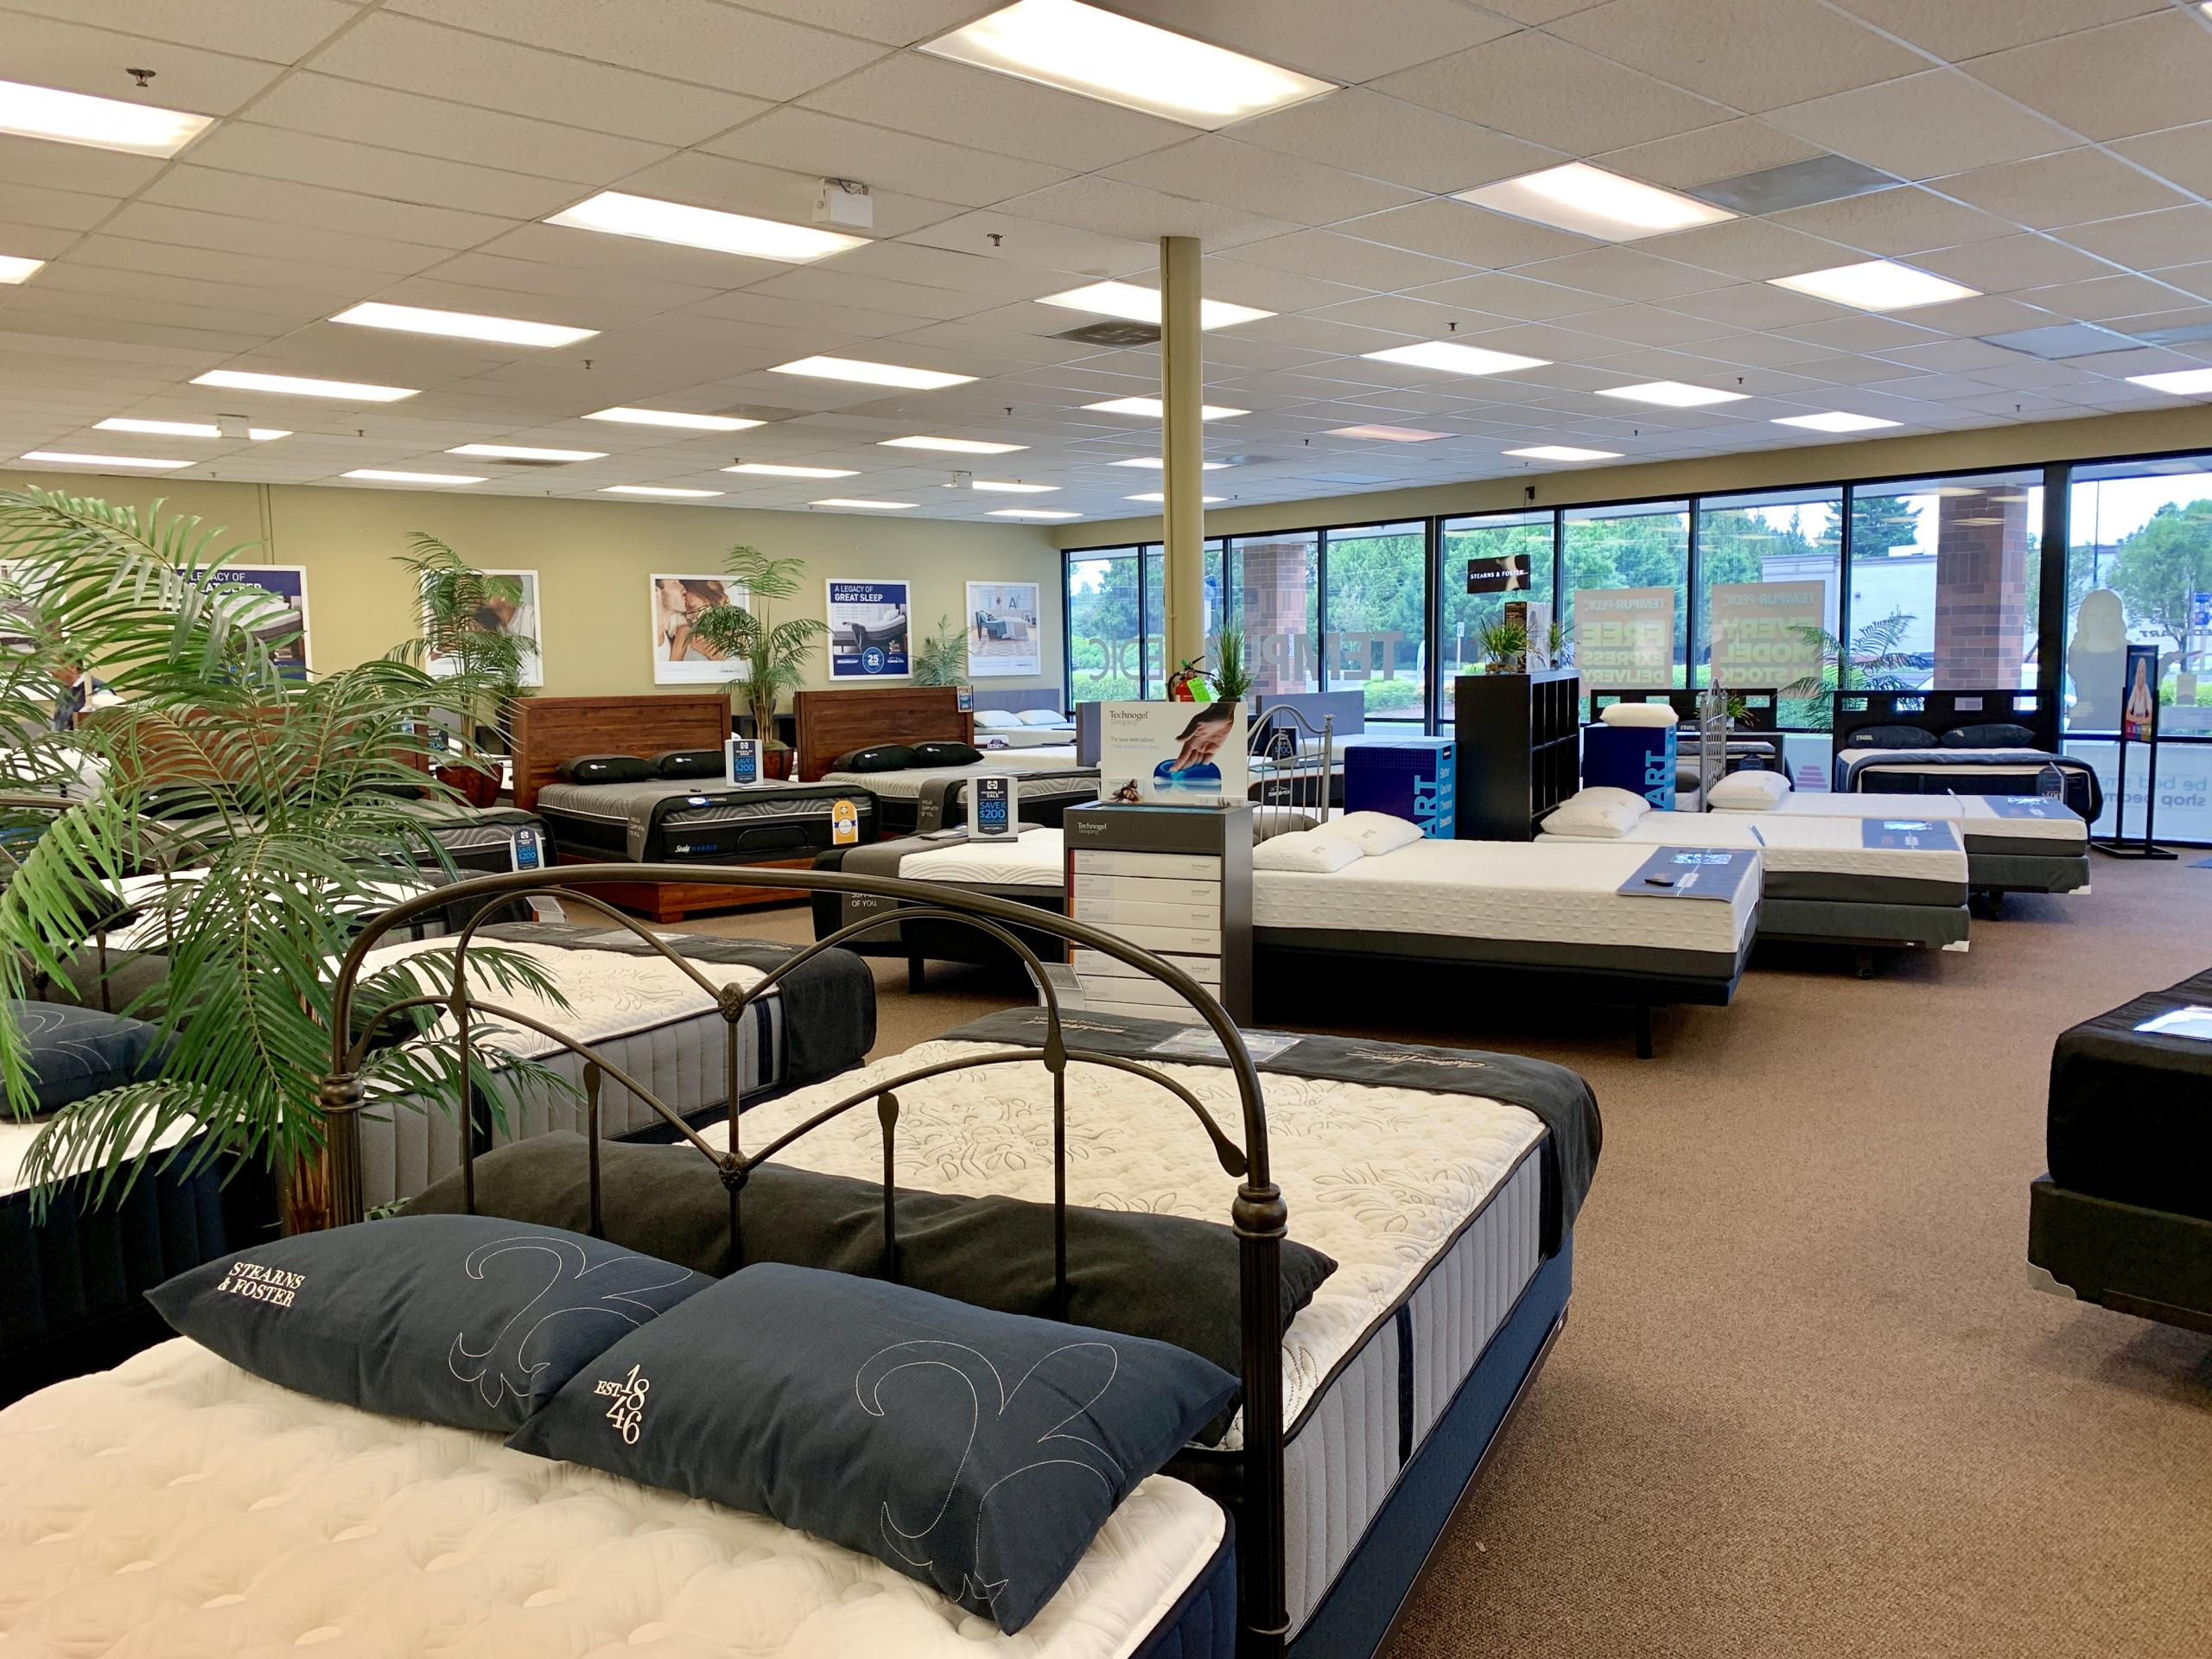 sherwood mattress store interior